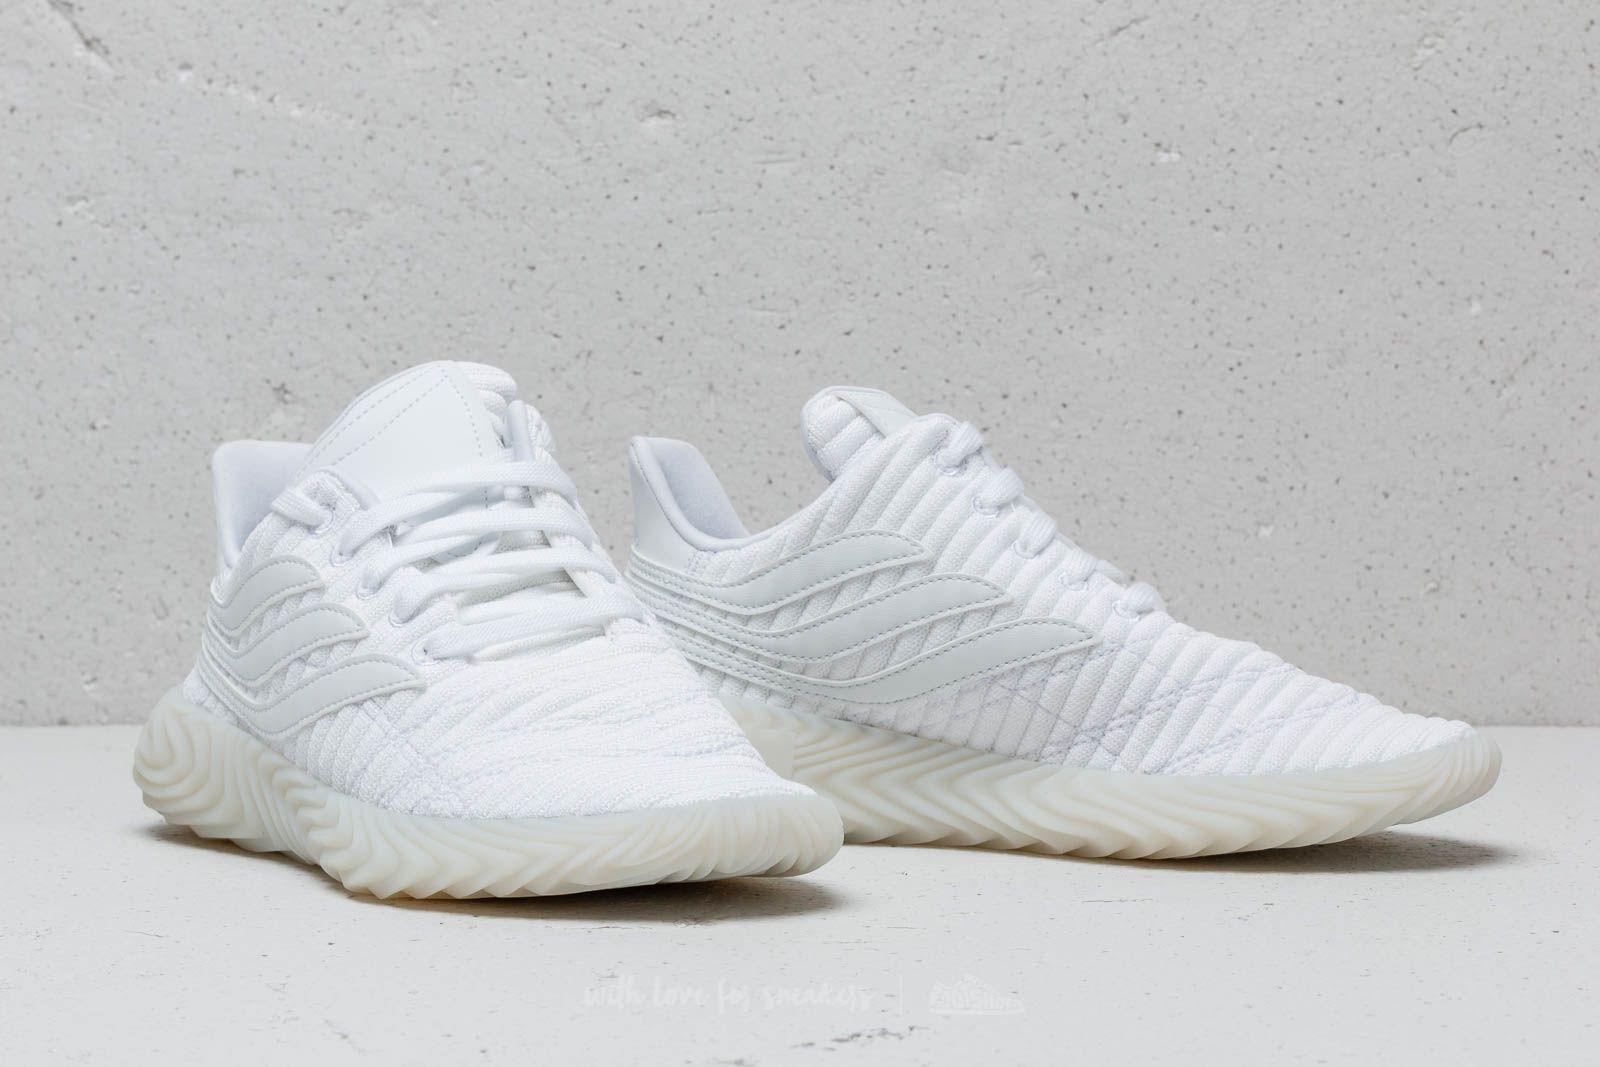 adidas Sobakov Modern J Ftw White  Ftw White  Ftw White at a great price 50e5c05418